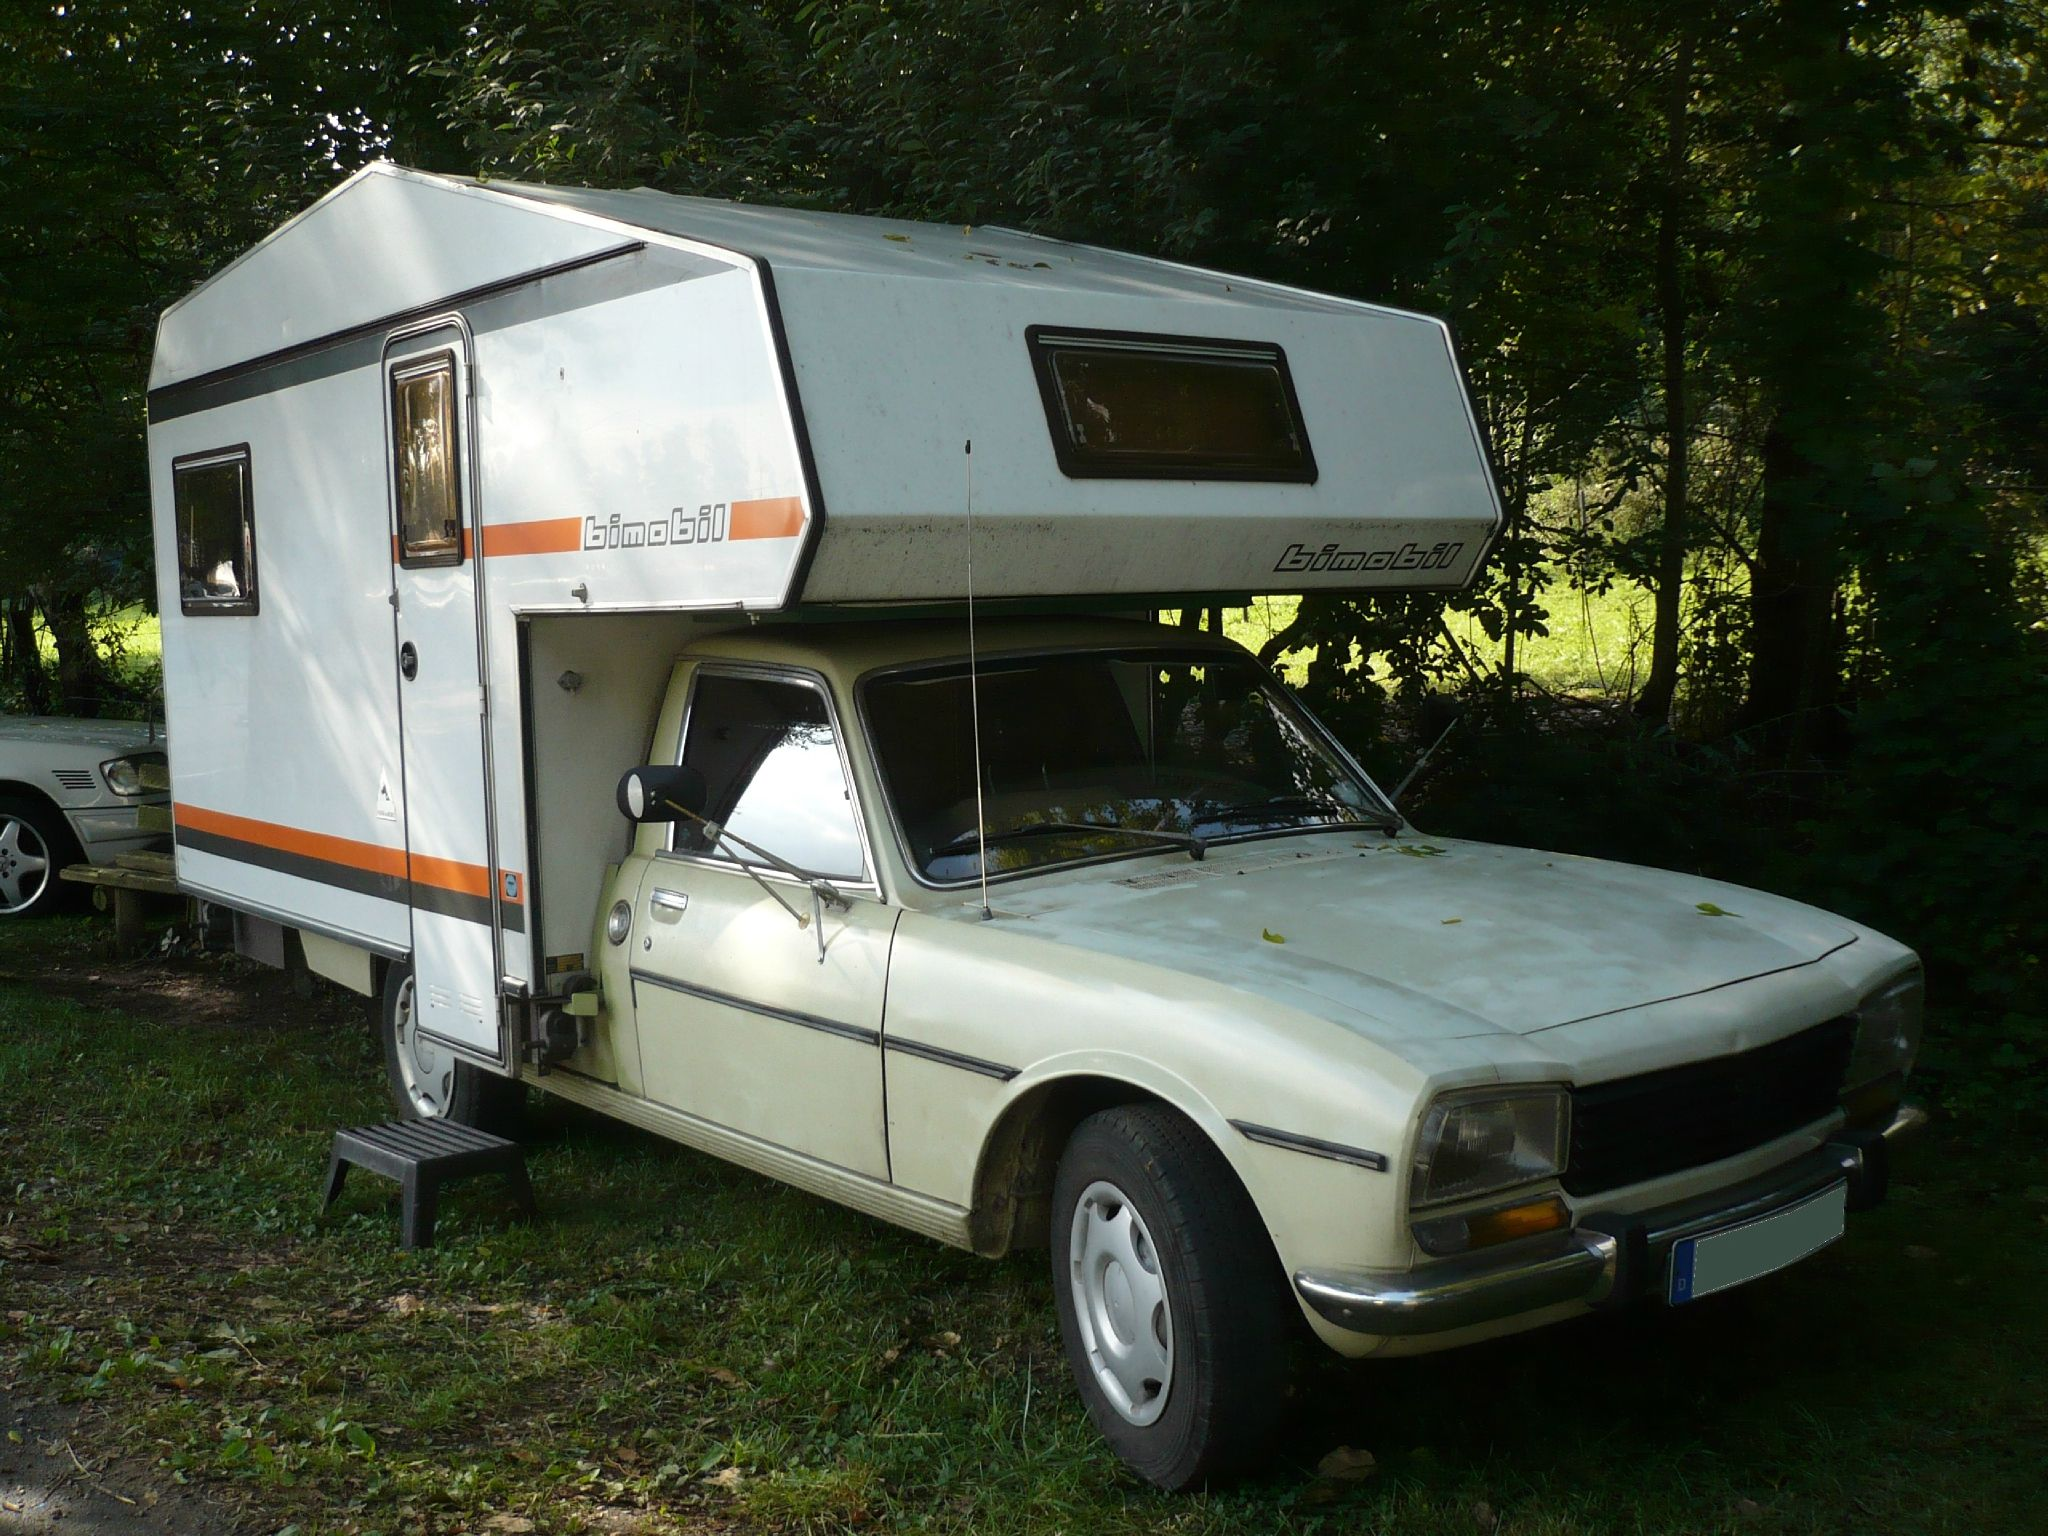 PEUGEOT 504 camping car cellule Bimobil campingcar